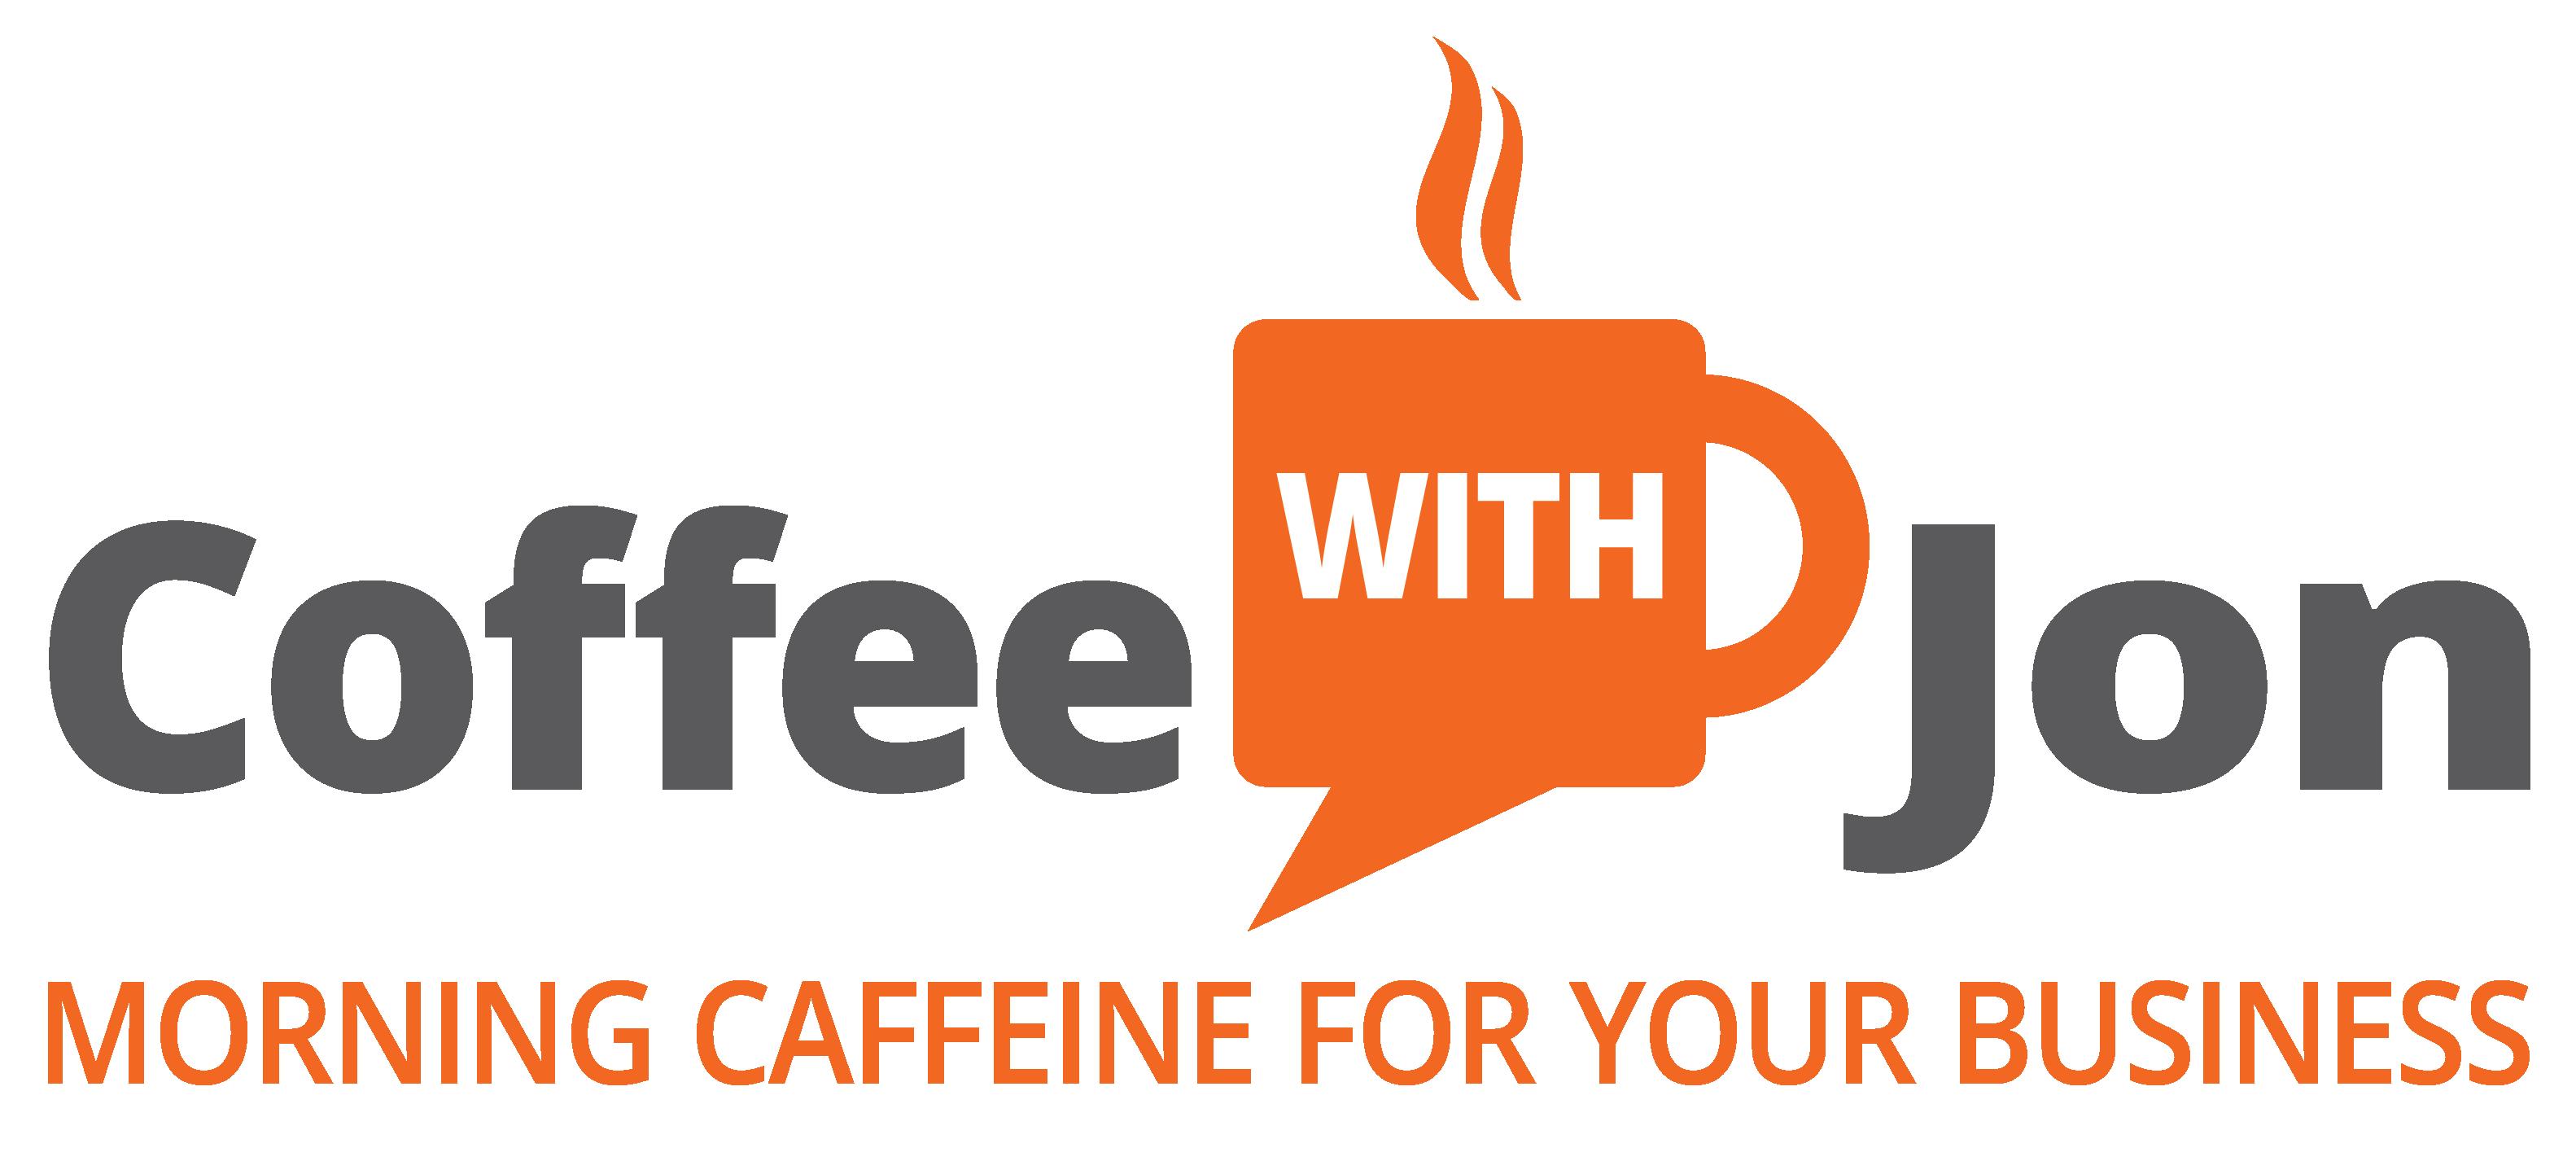 Coffee with Jon logo